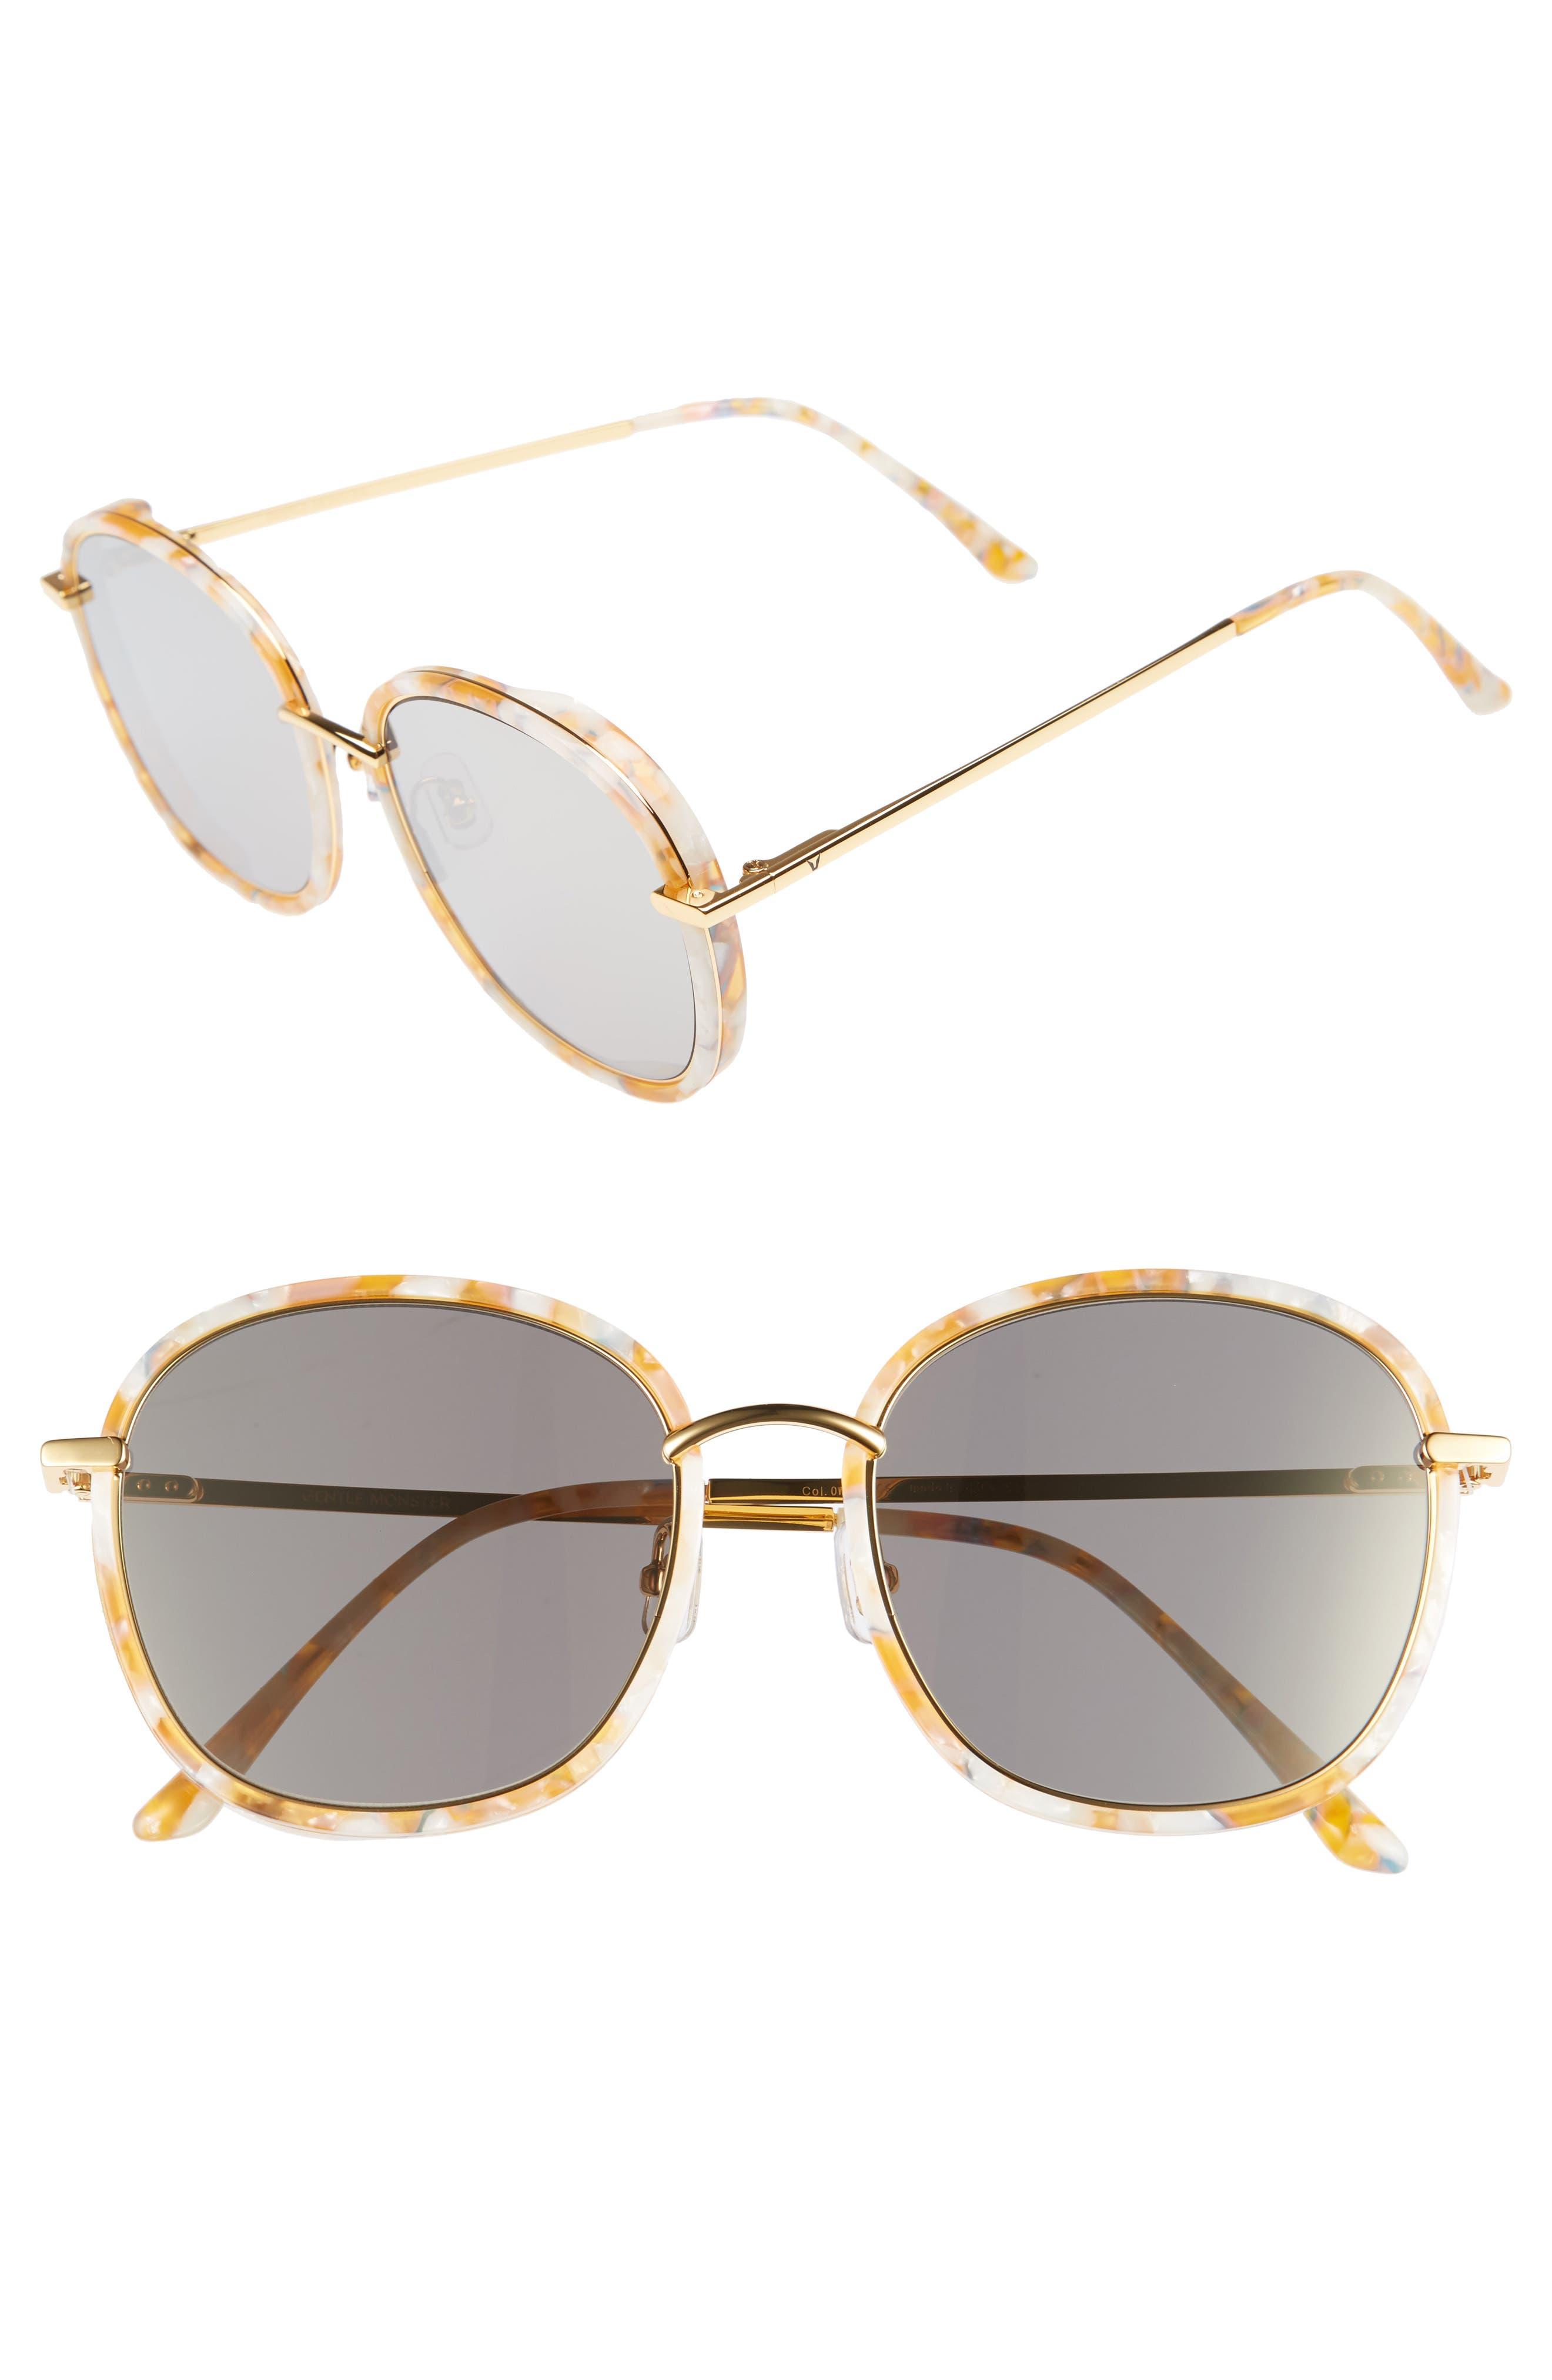 Mad Crush 57mm Round Sunglasses,                             Main thumbnail 1, color,                             800